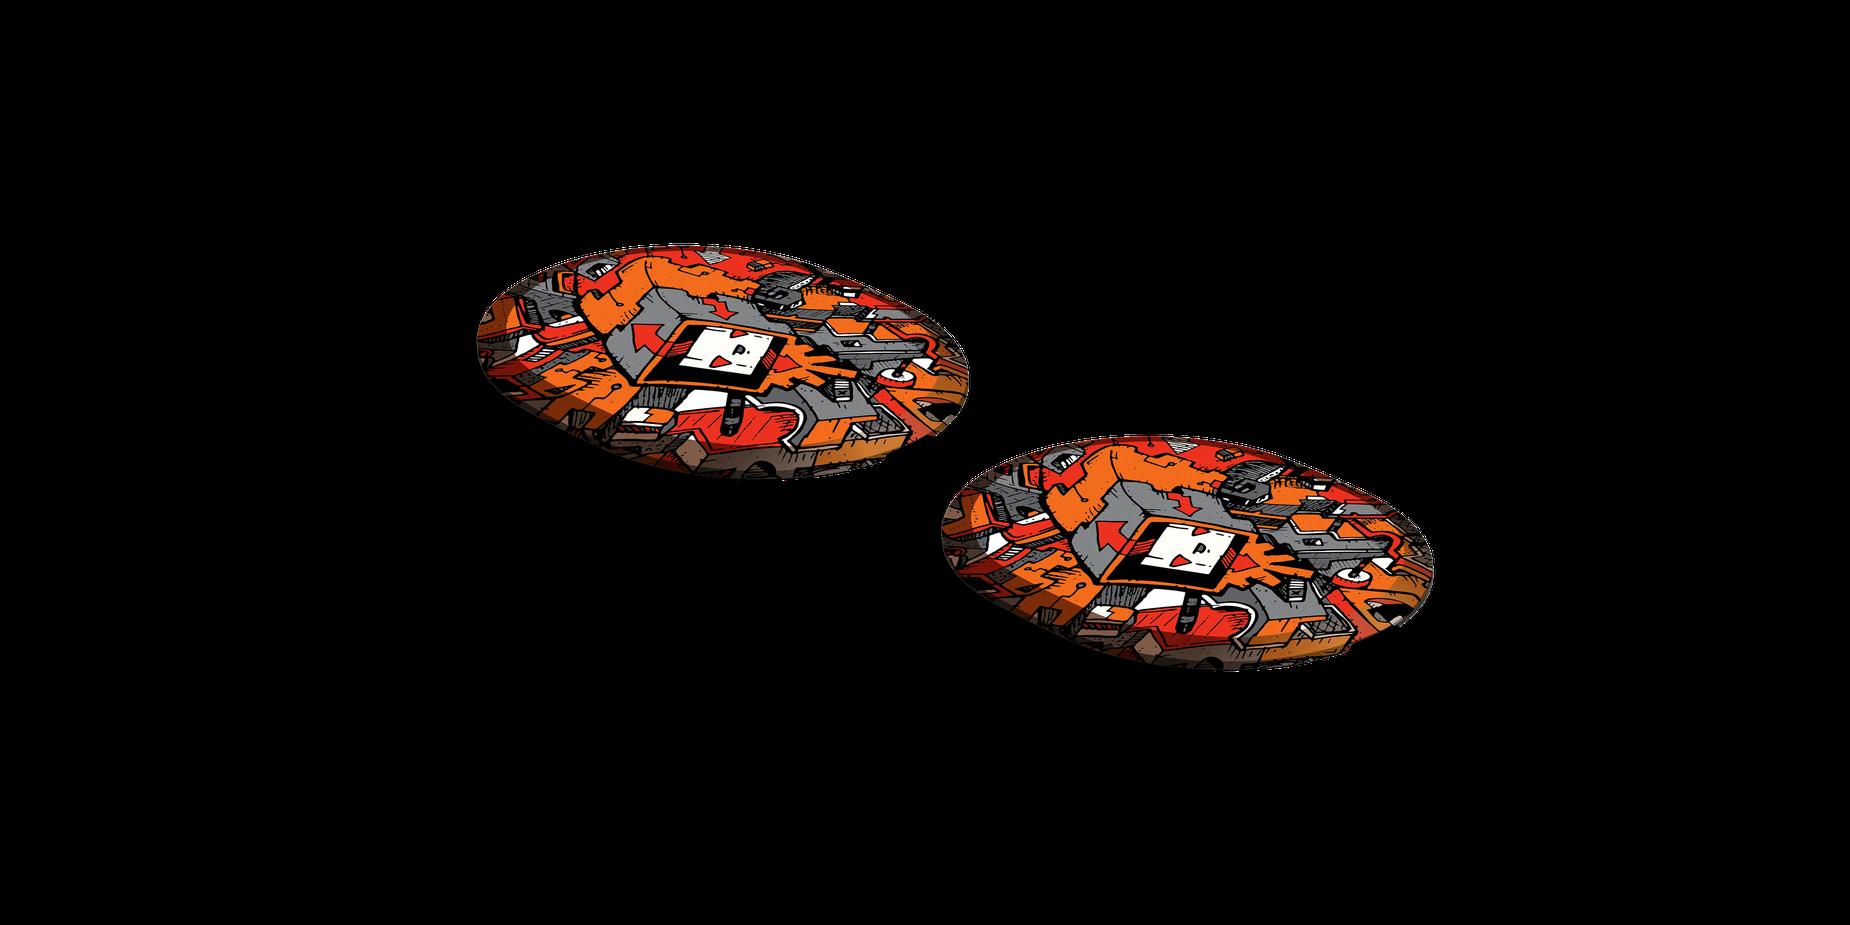 Two Arctis Pro speaker plates designed by Artist Dune Haggar